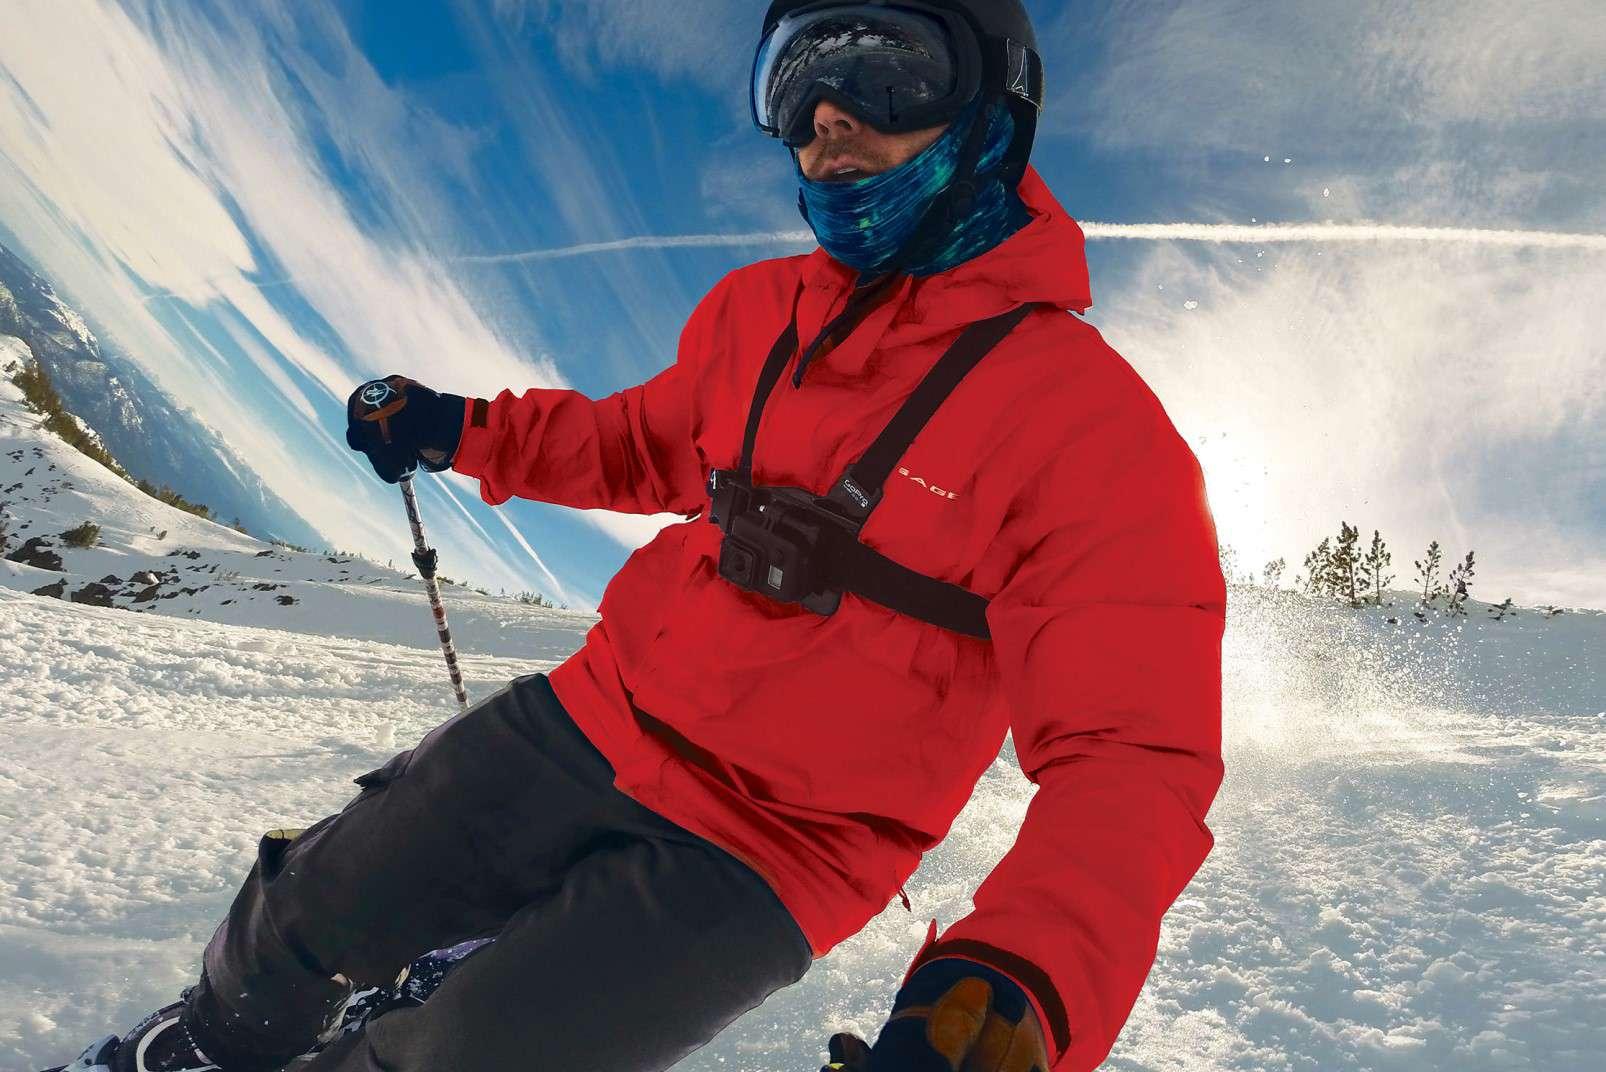 GoPro HERO7 Black and winter sports